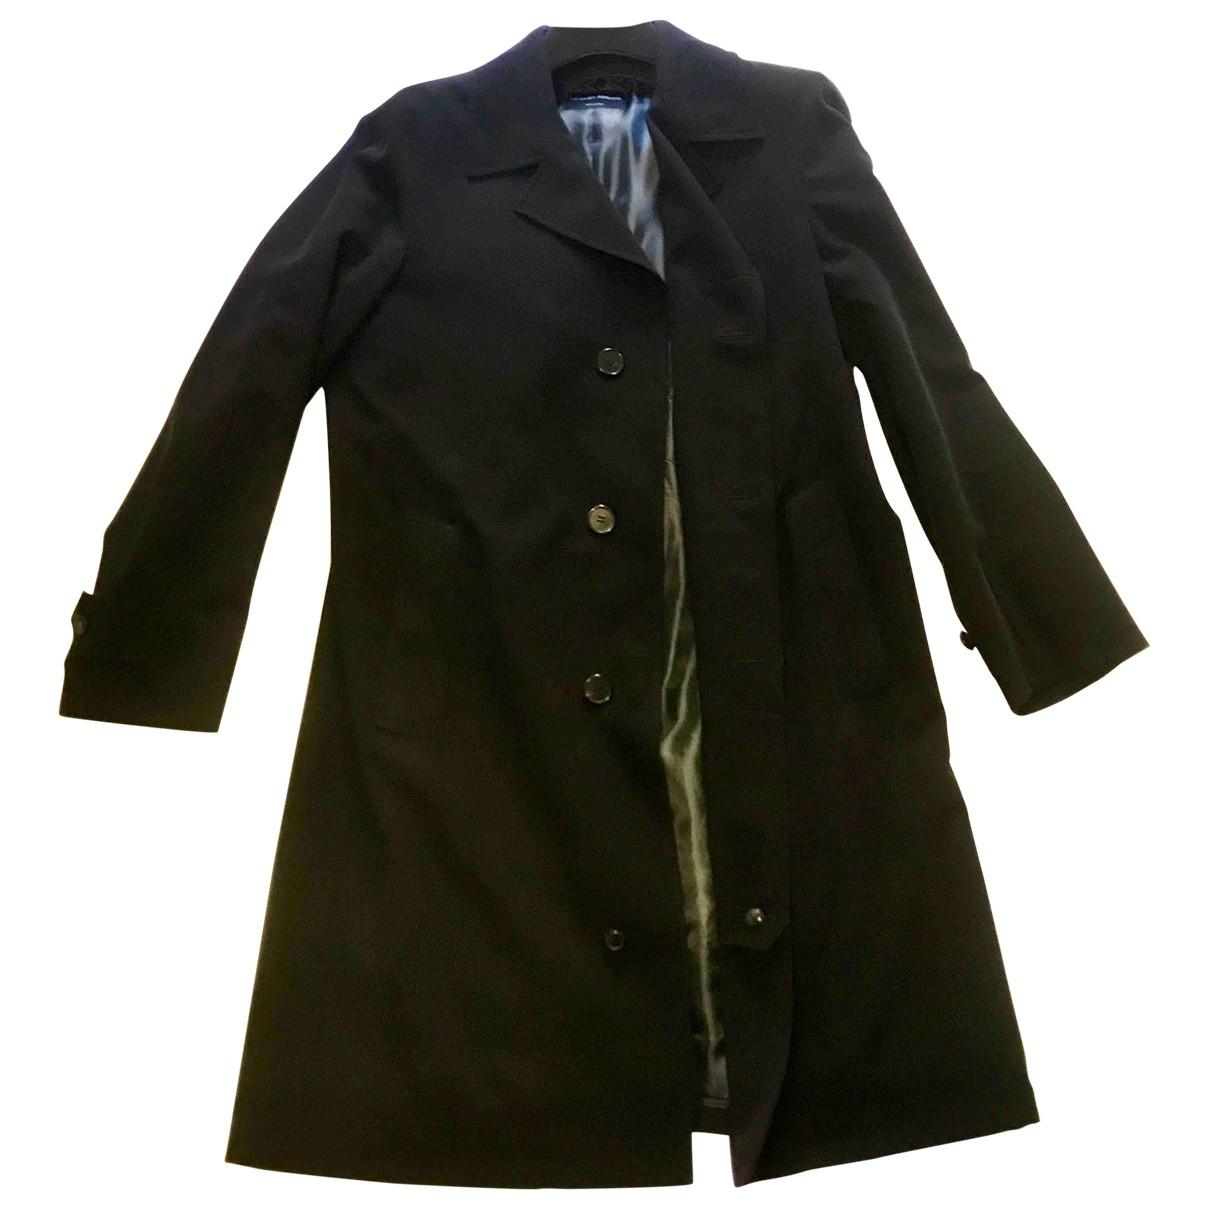 Giorgio Armani - Manteau   pour homme - noir